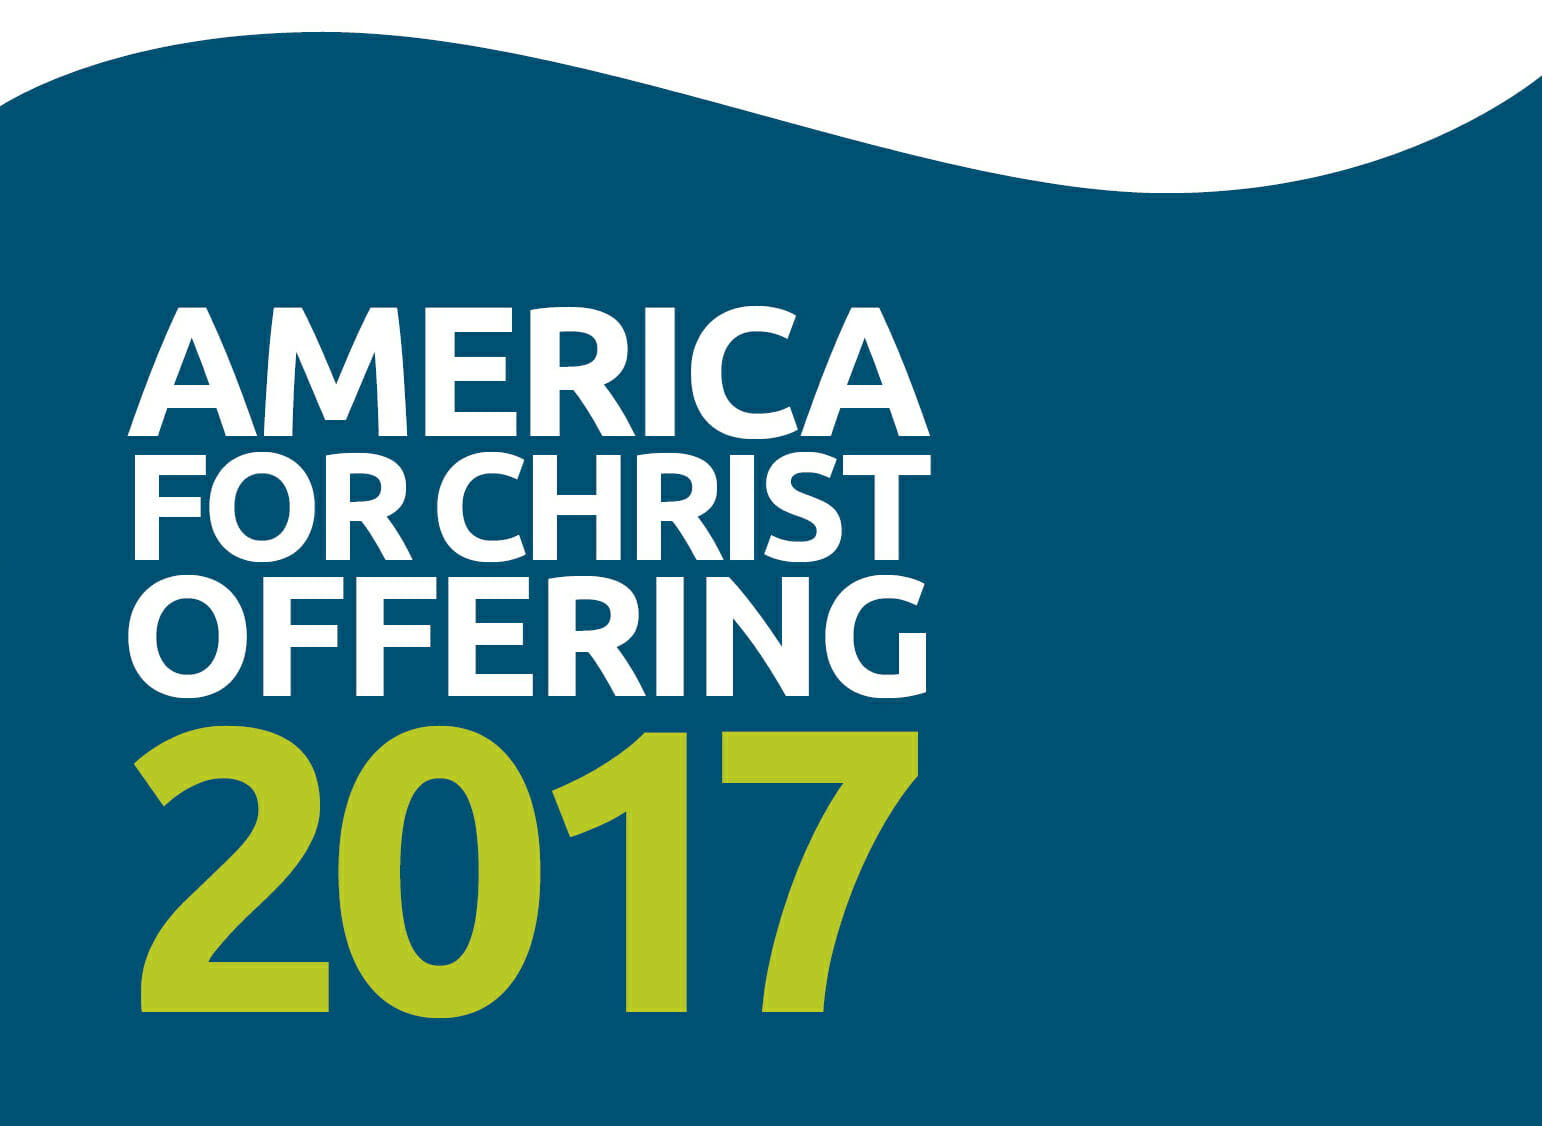 America for Christ 2017